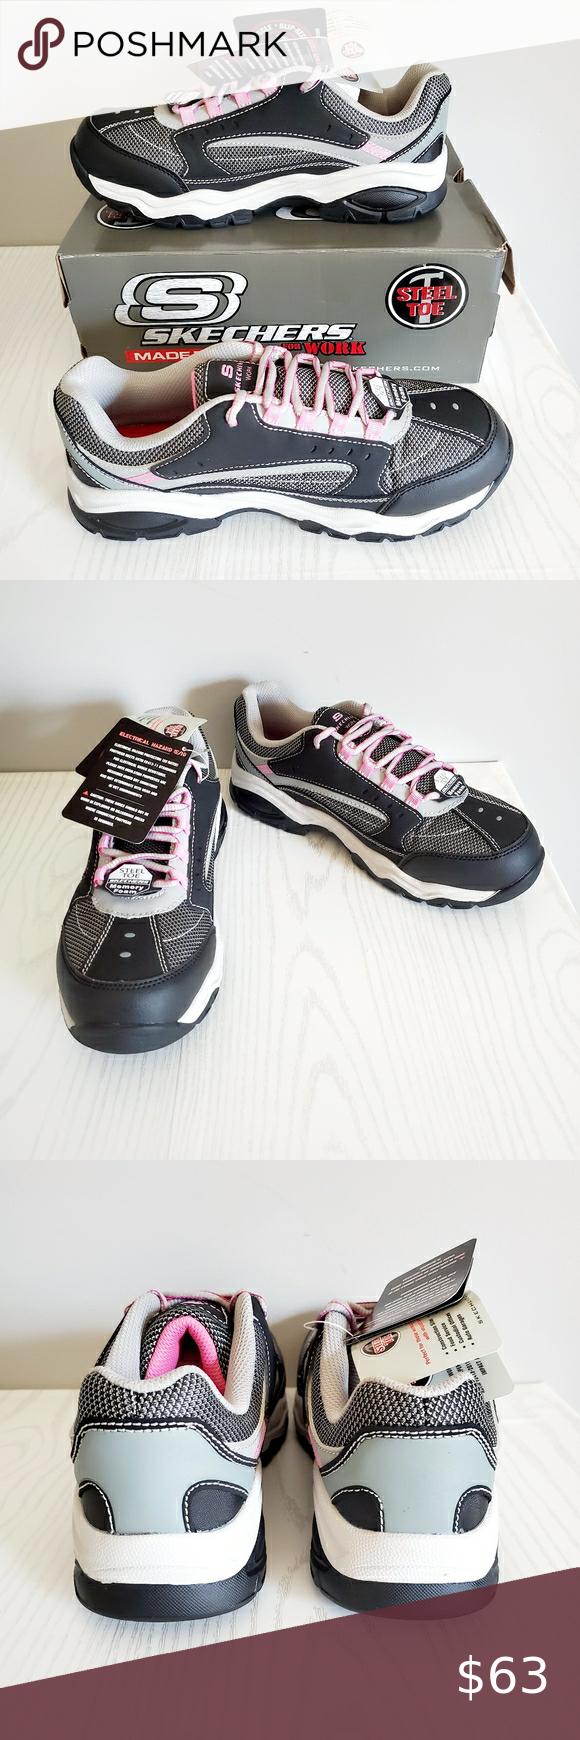 2020 | Skechers, Womens shoes sneakers